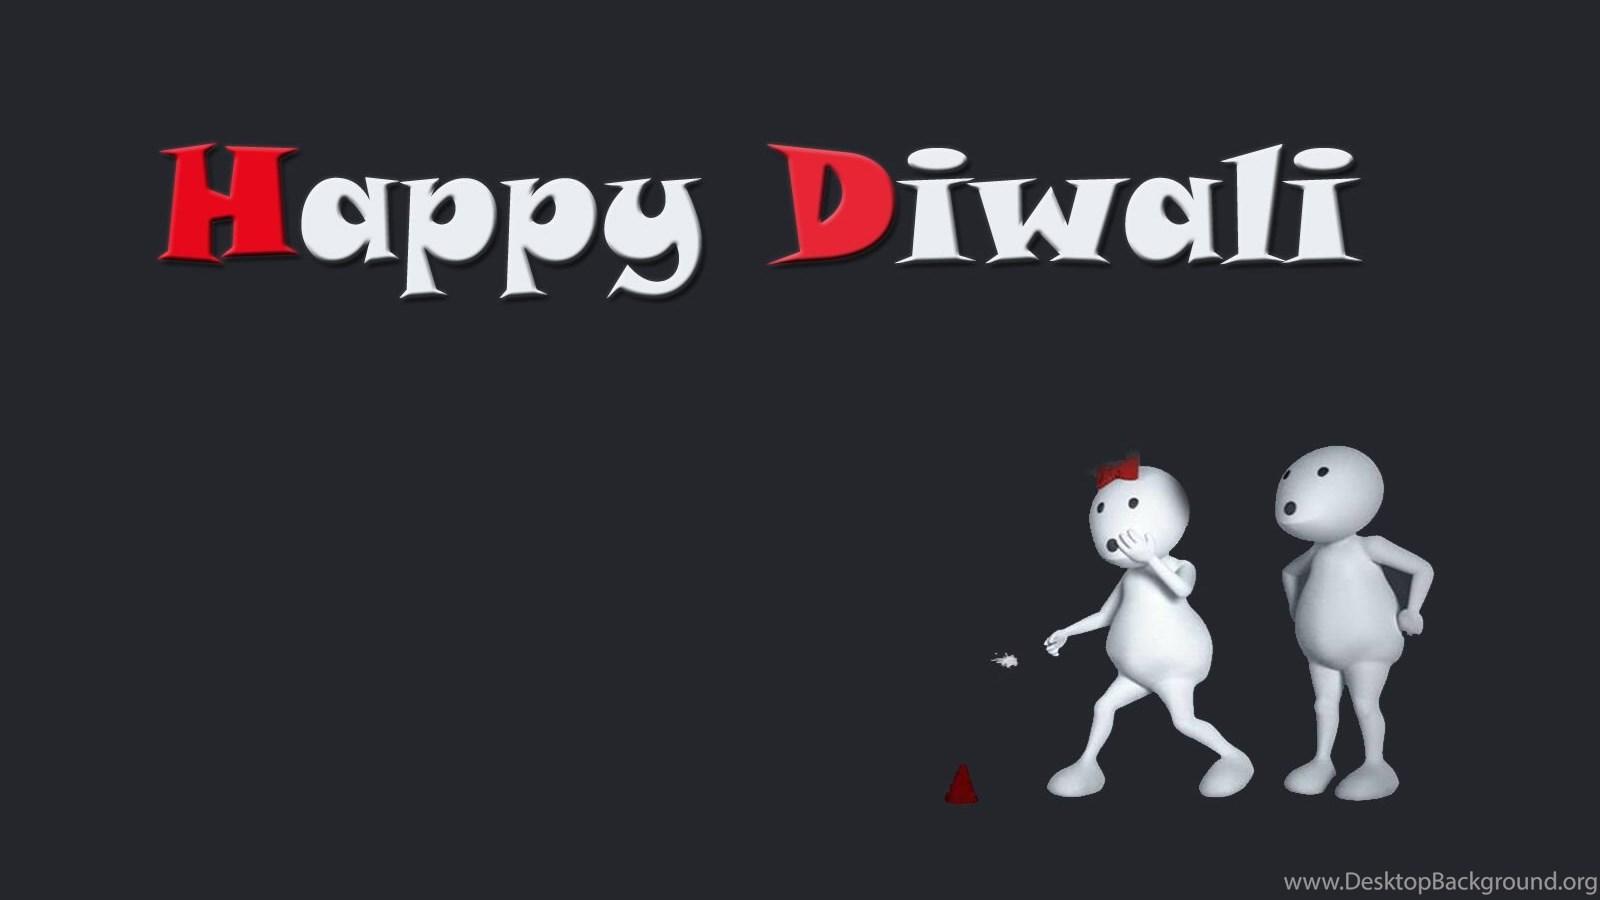 funny happy diwali wallpapers desktop background desktopbackground org